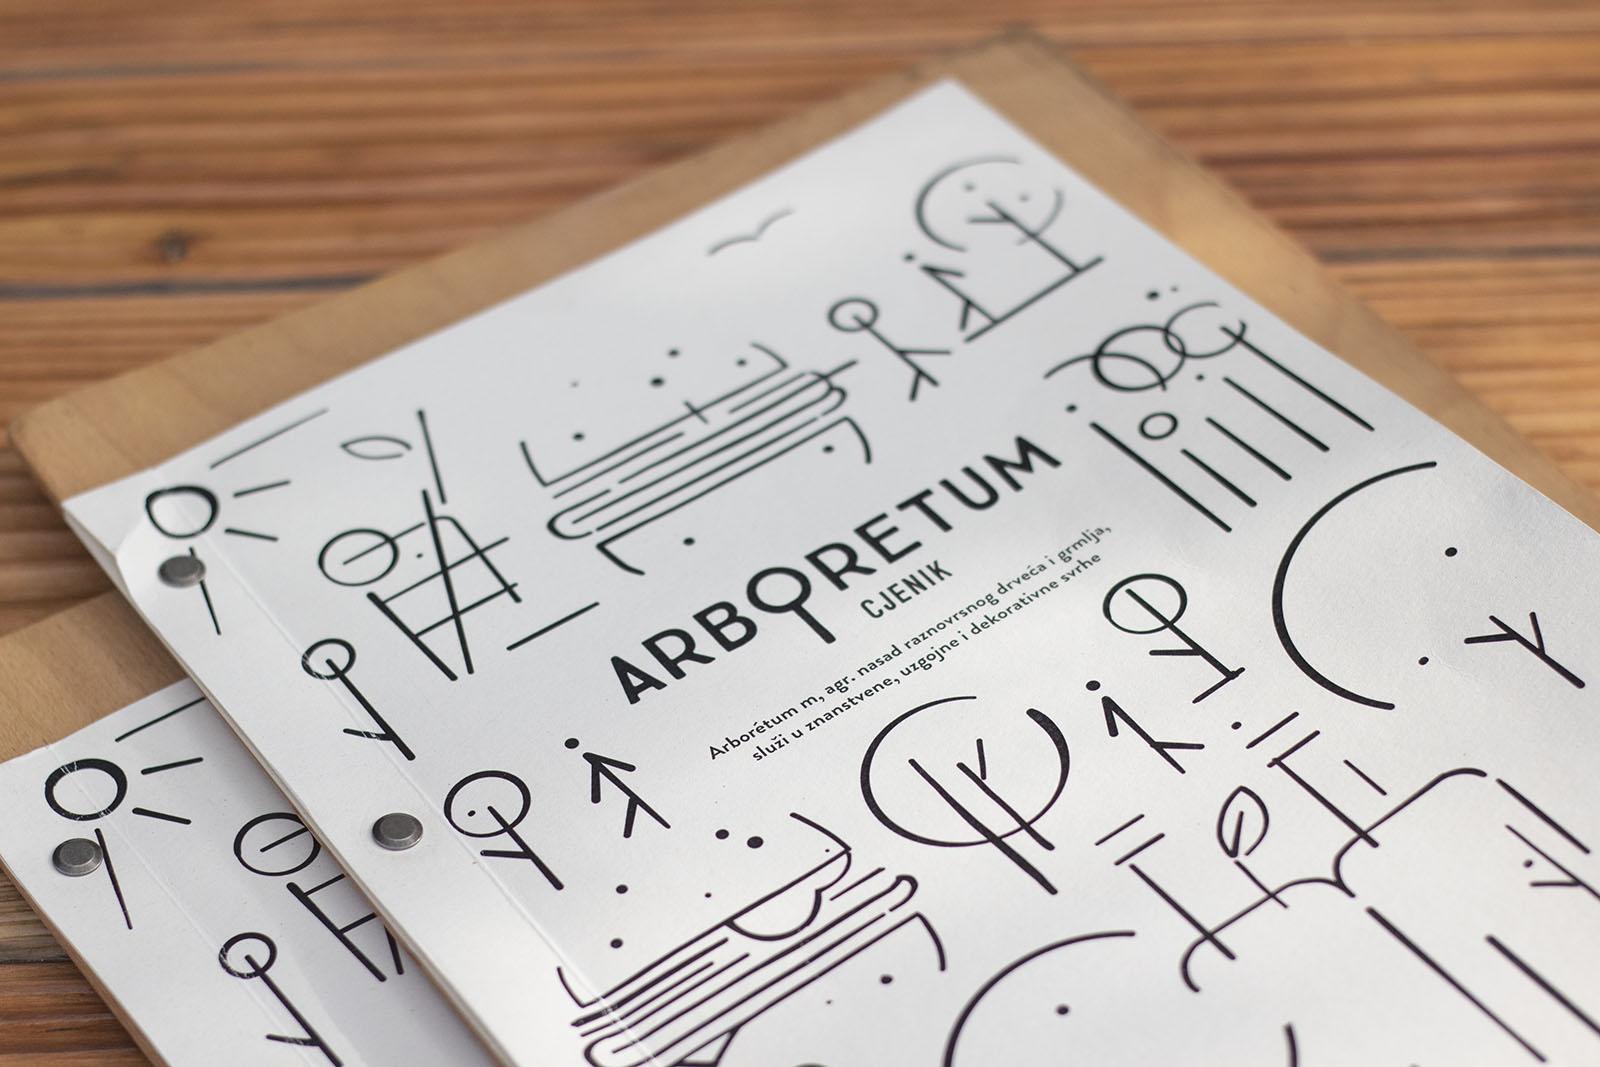 arboretum_jelovnik_menu_design.jpg